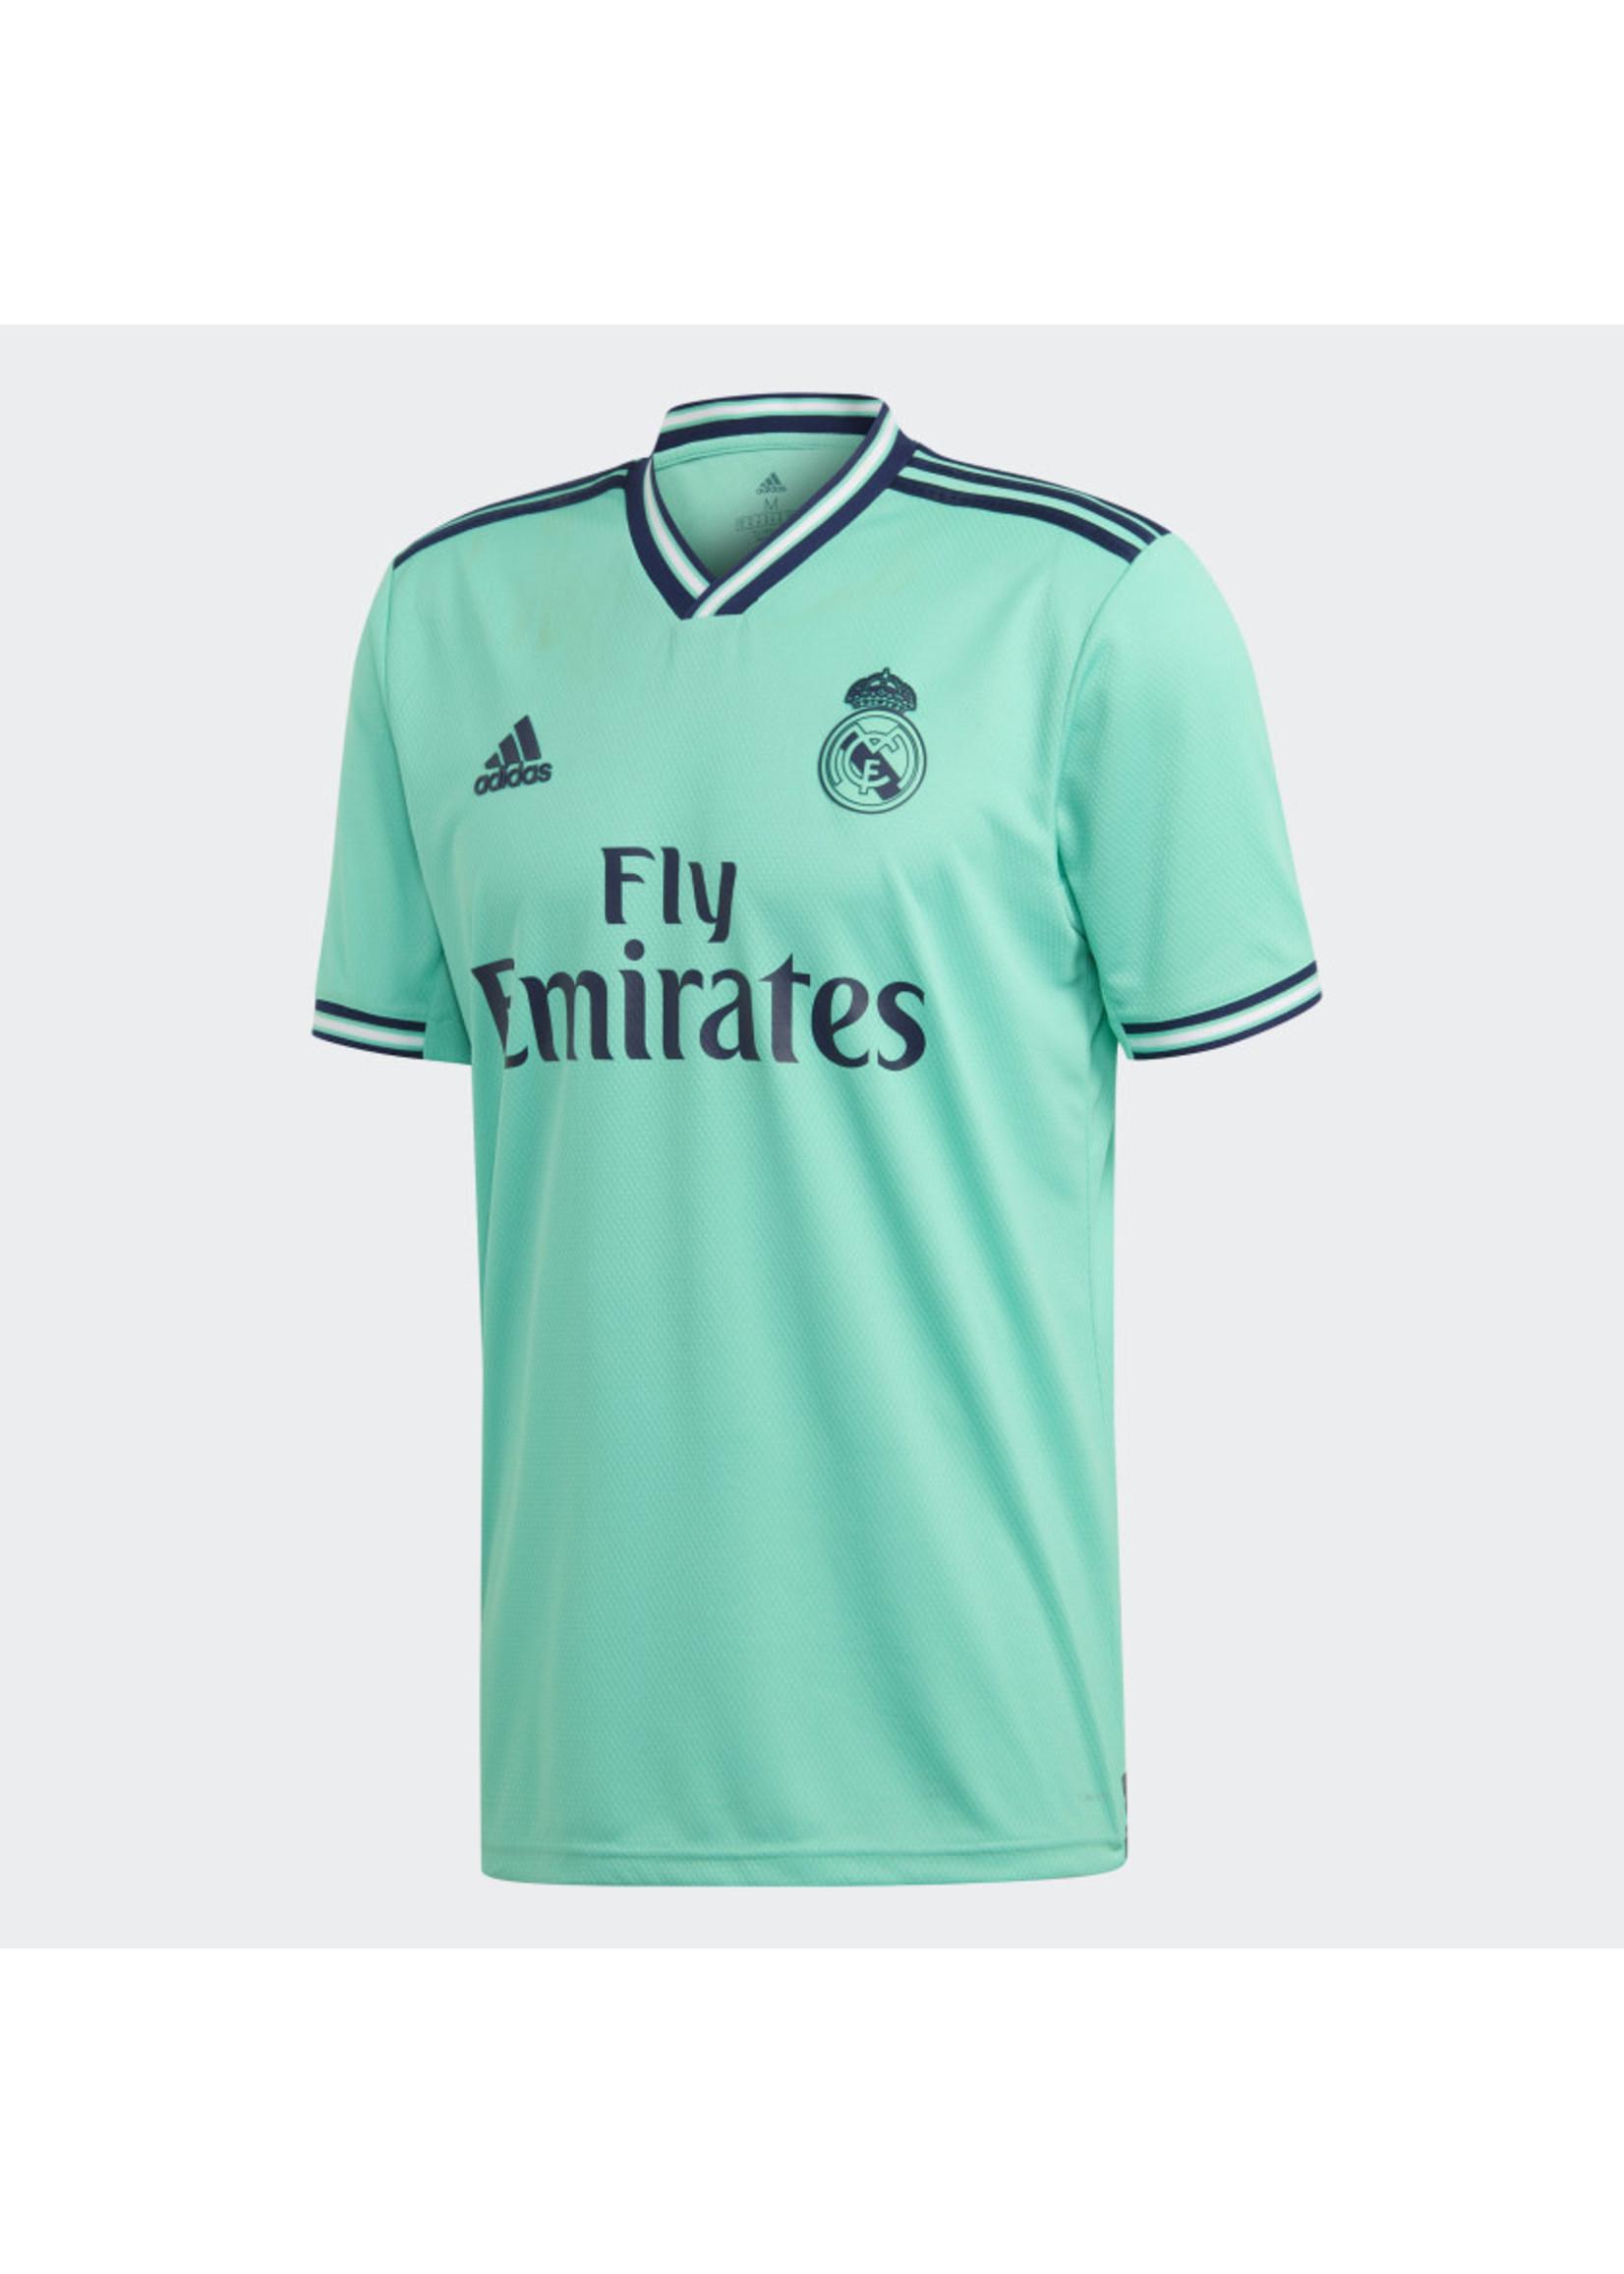 Adidas Real Madrid 19/20 Third Jersey Adult XXL